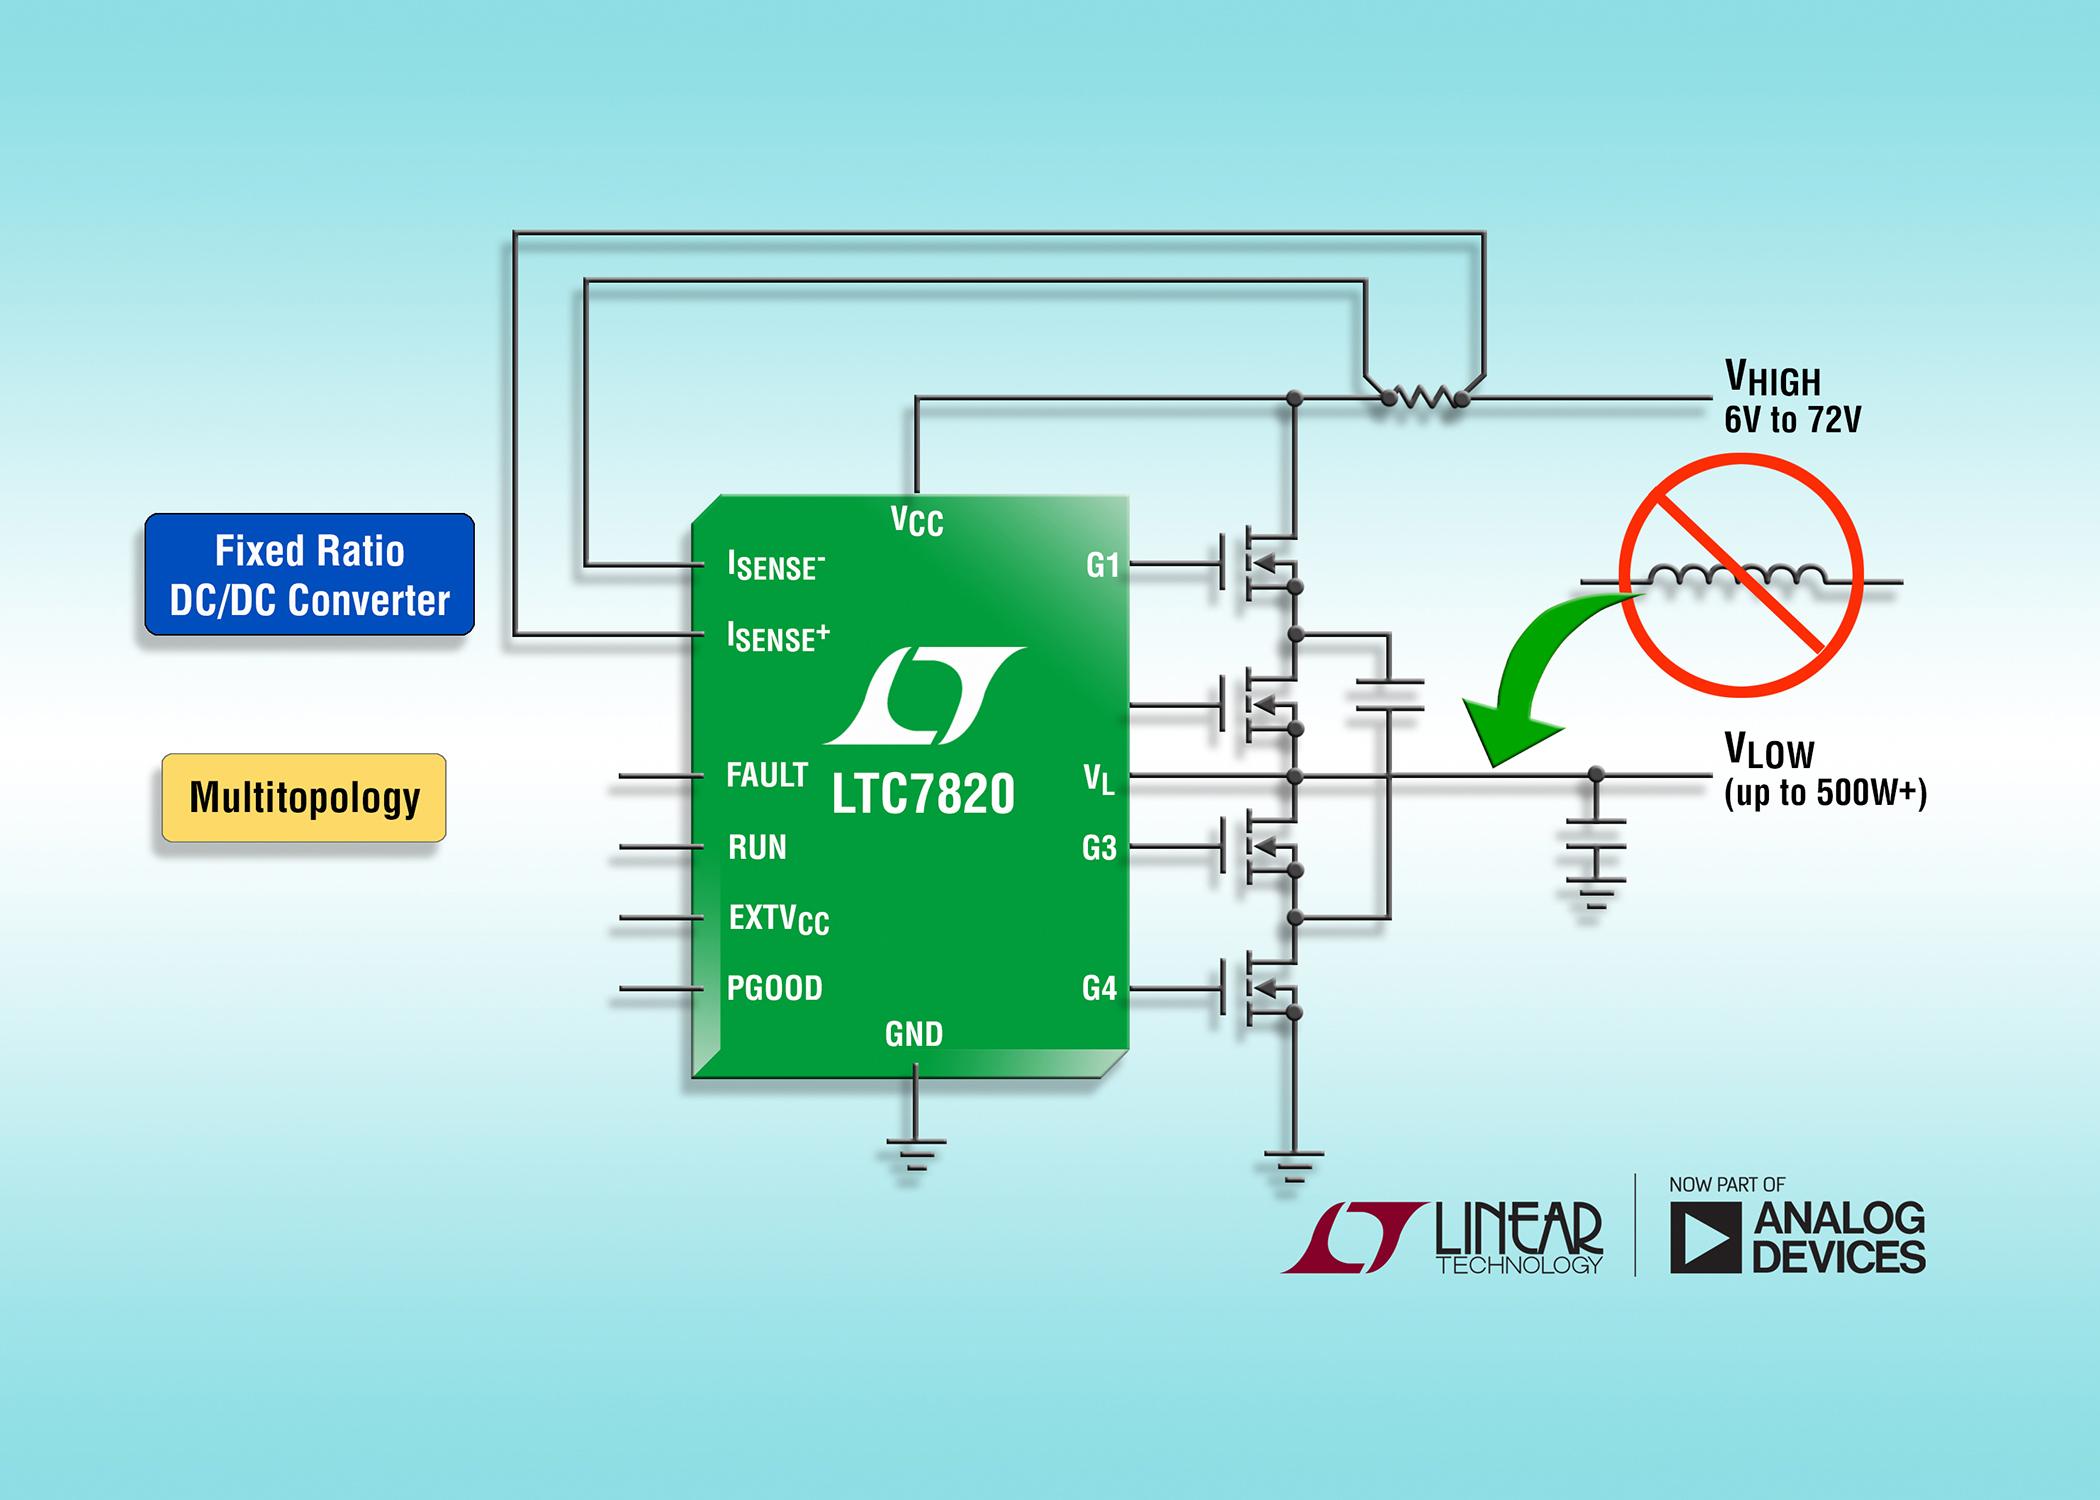 72V fixed-ratio DC/DC controller